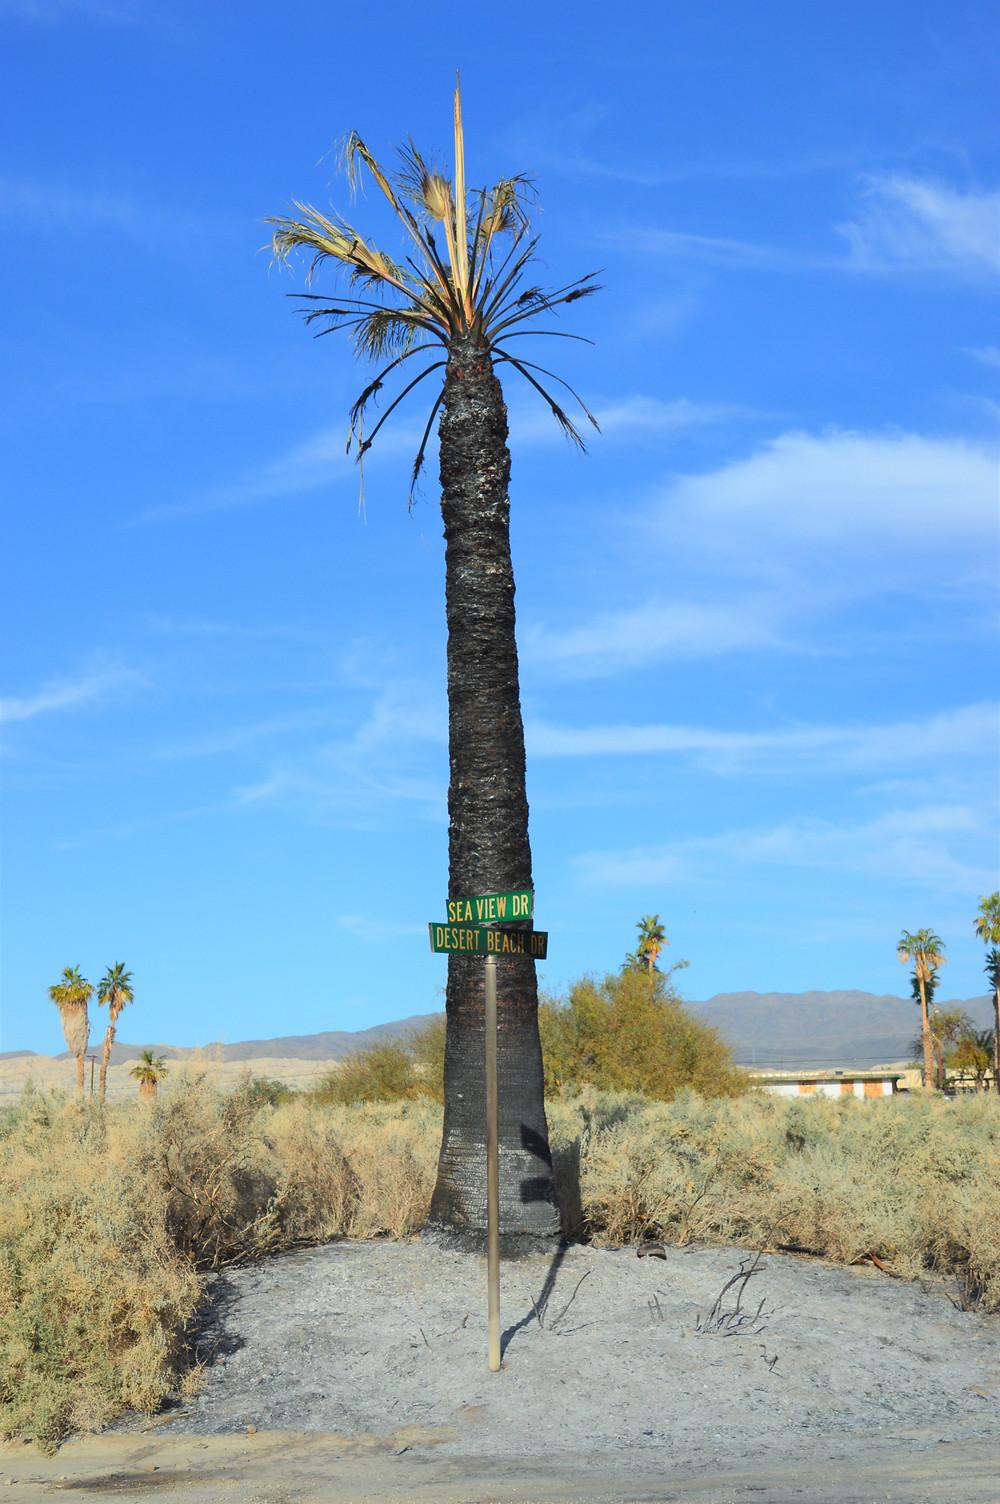 Burned palm tree in abandoned Salton Sea community